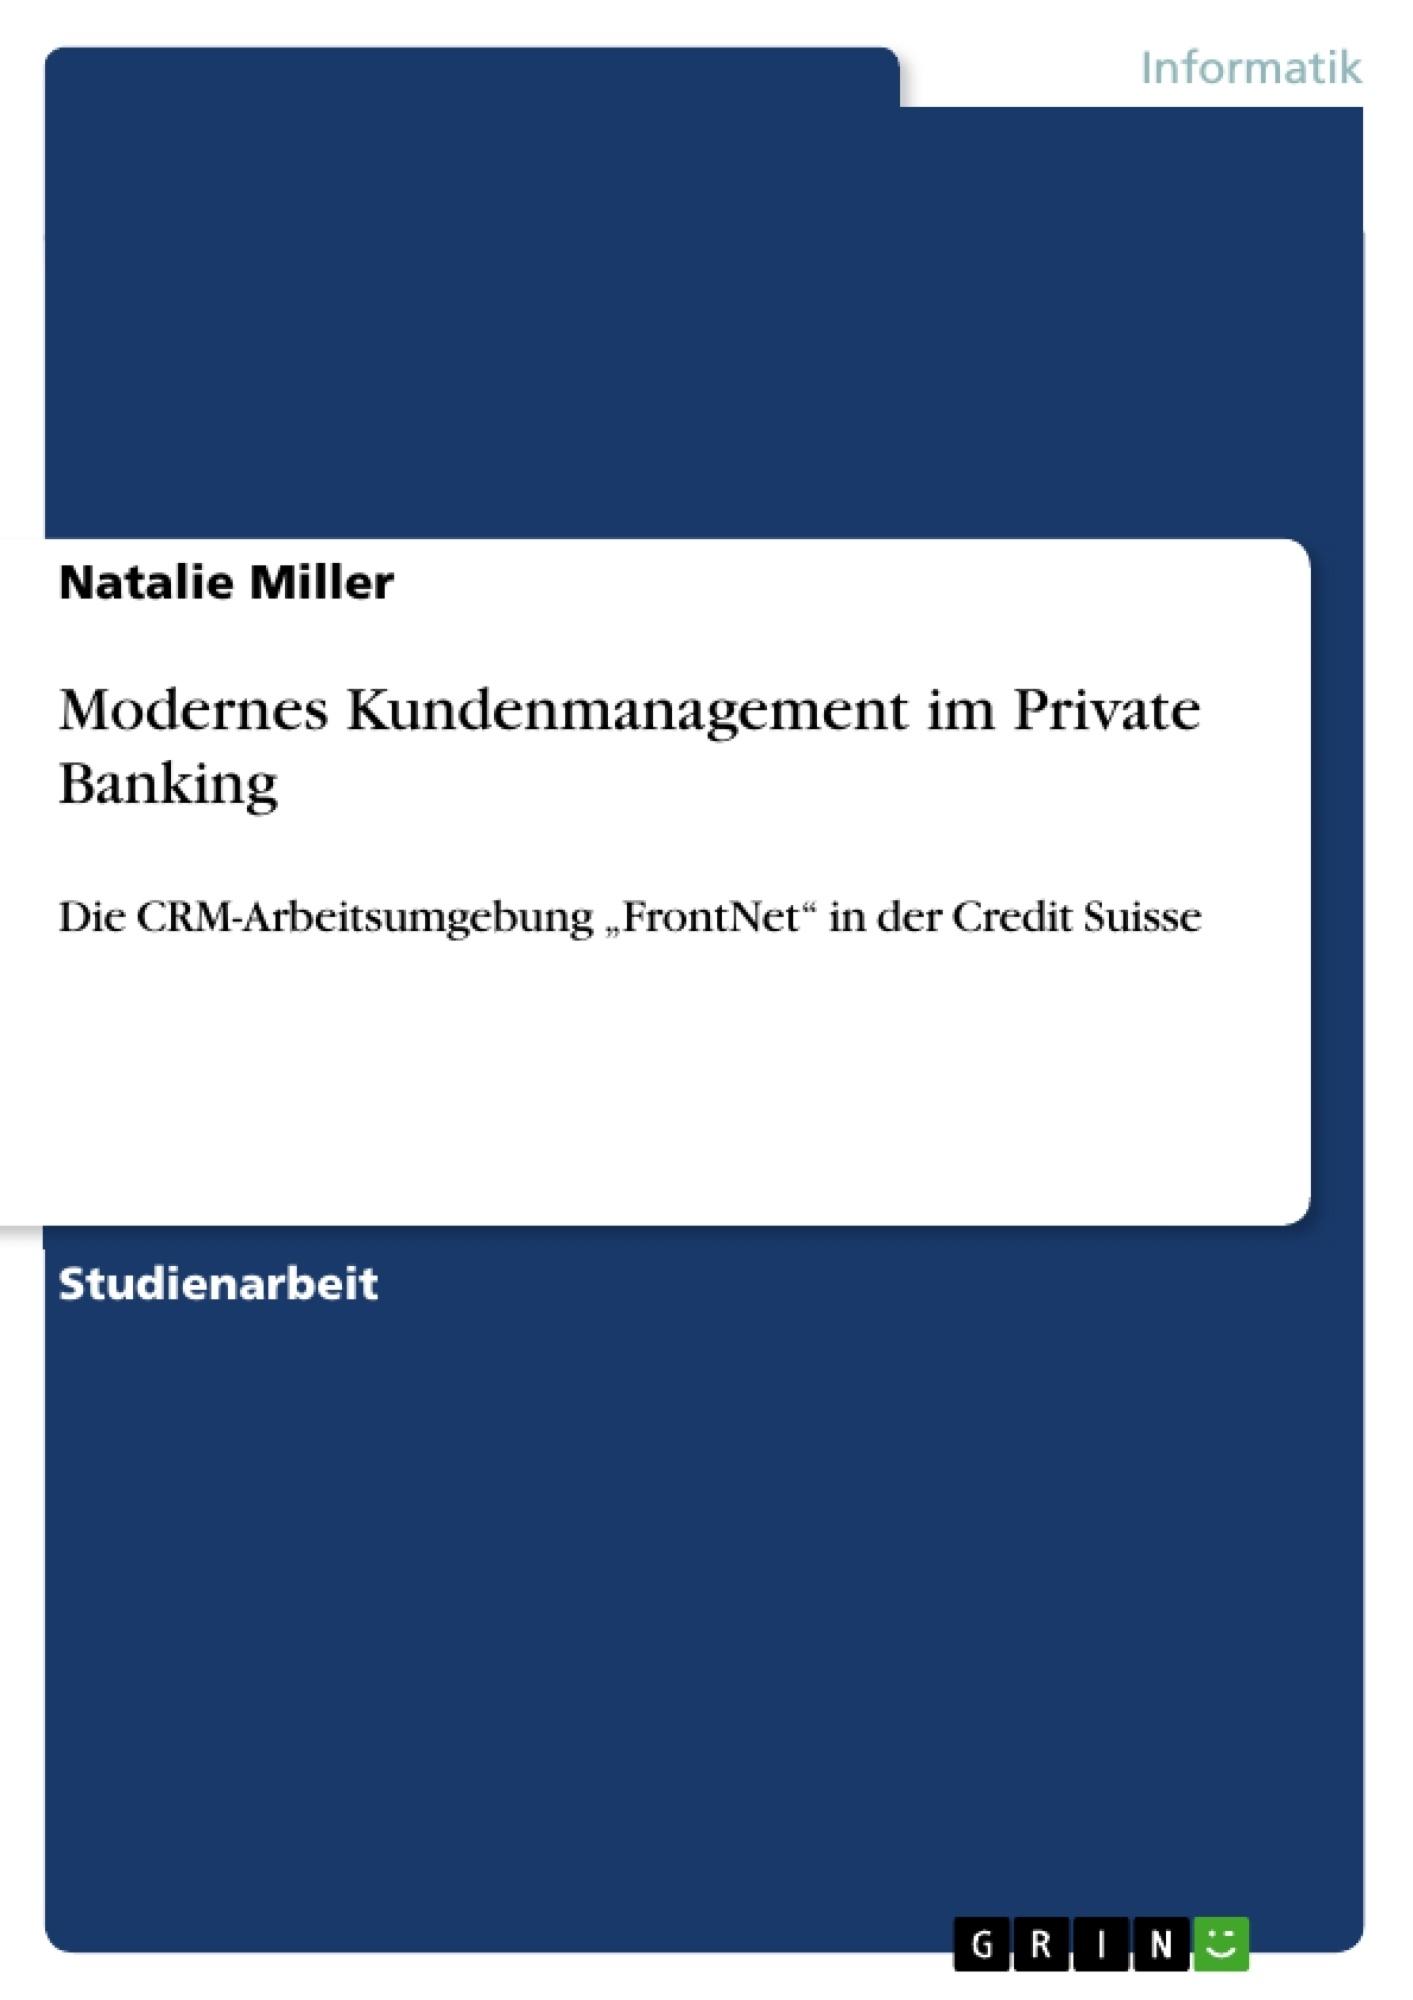 Titel: Modernes Kundenmanagement im Private Banking